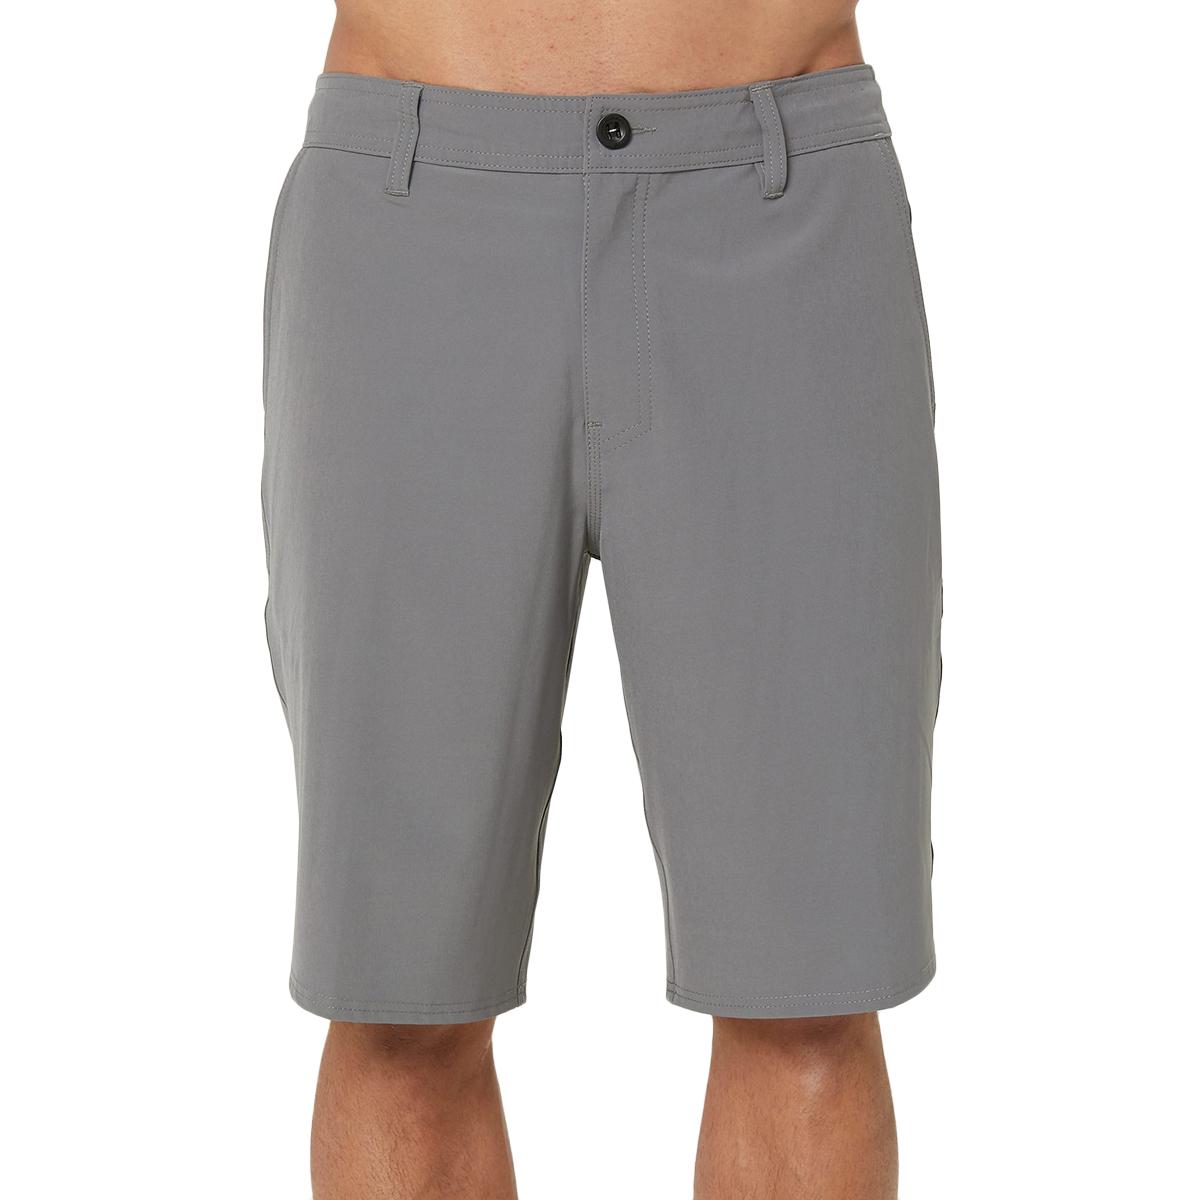 O'neill Men's Loaded Reserve Hybrid Shorts - Black, 36